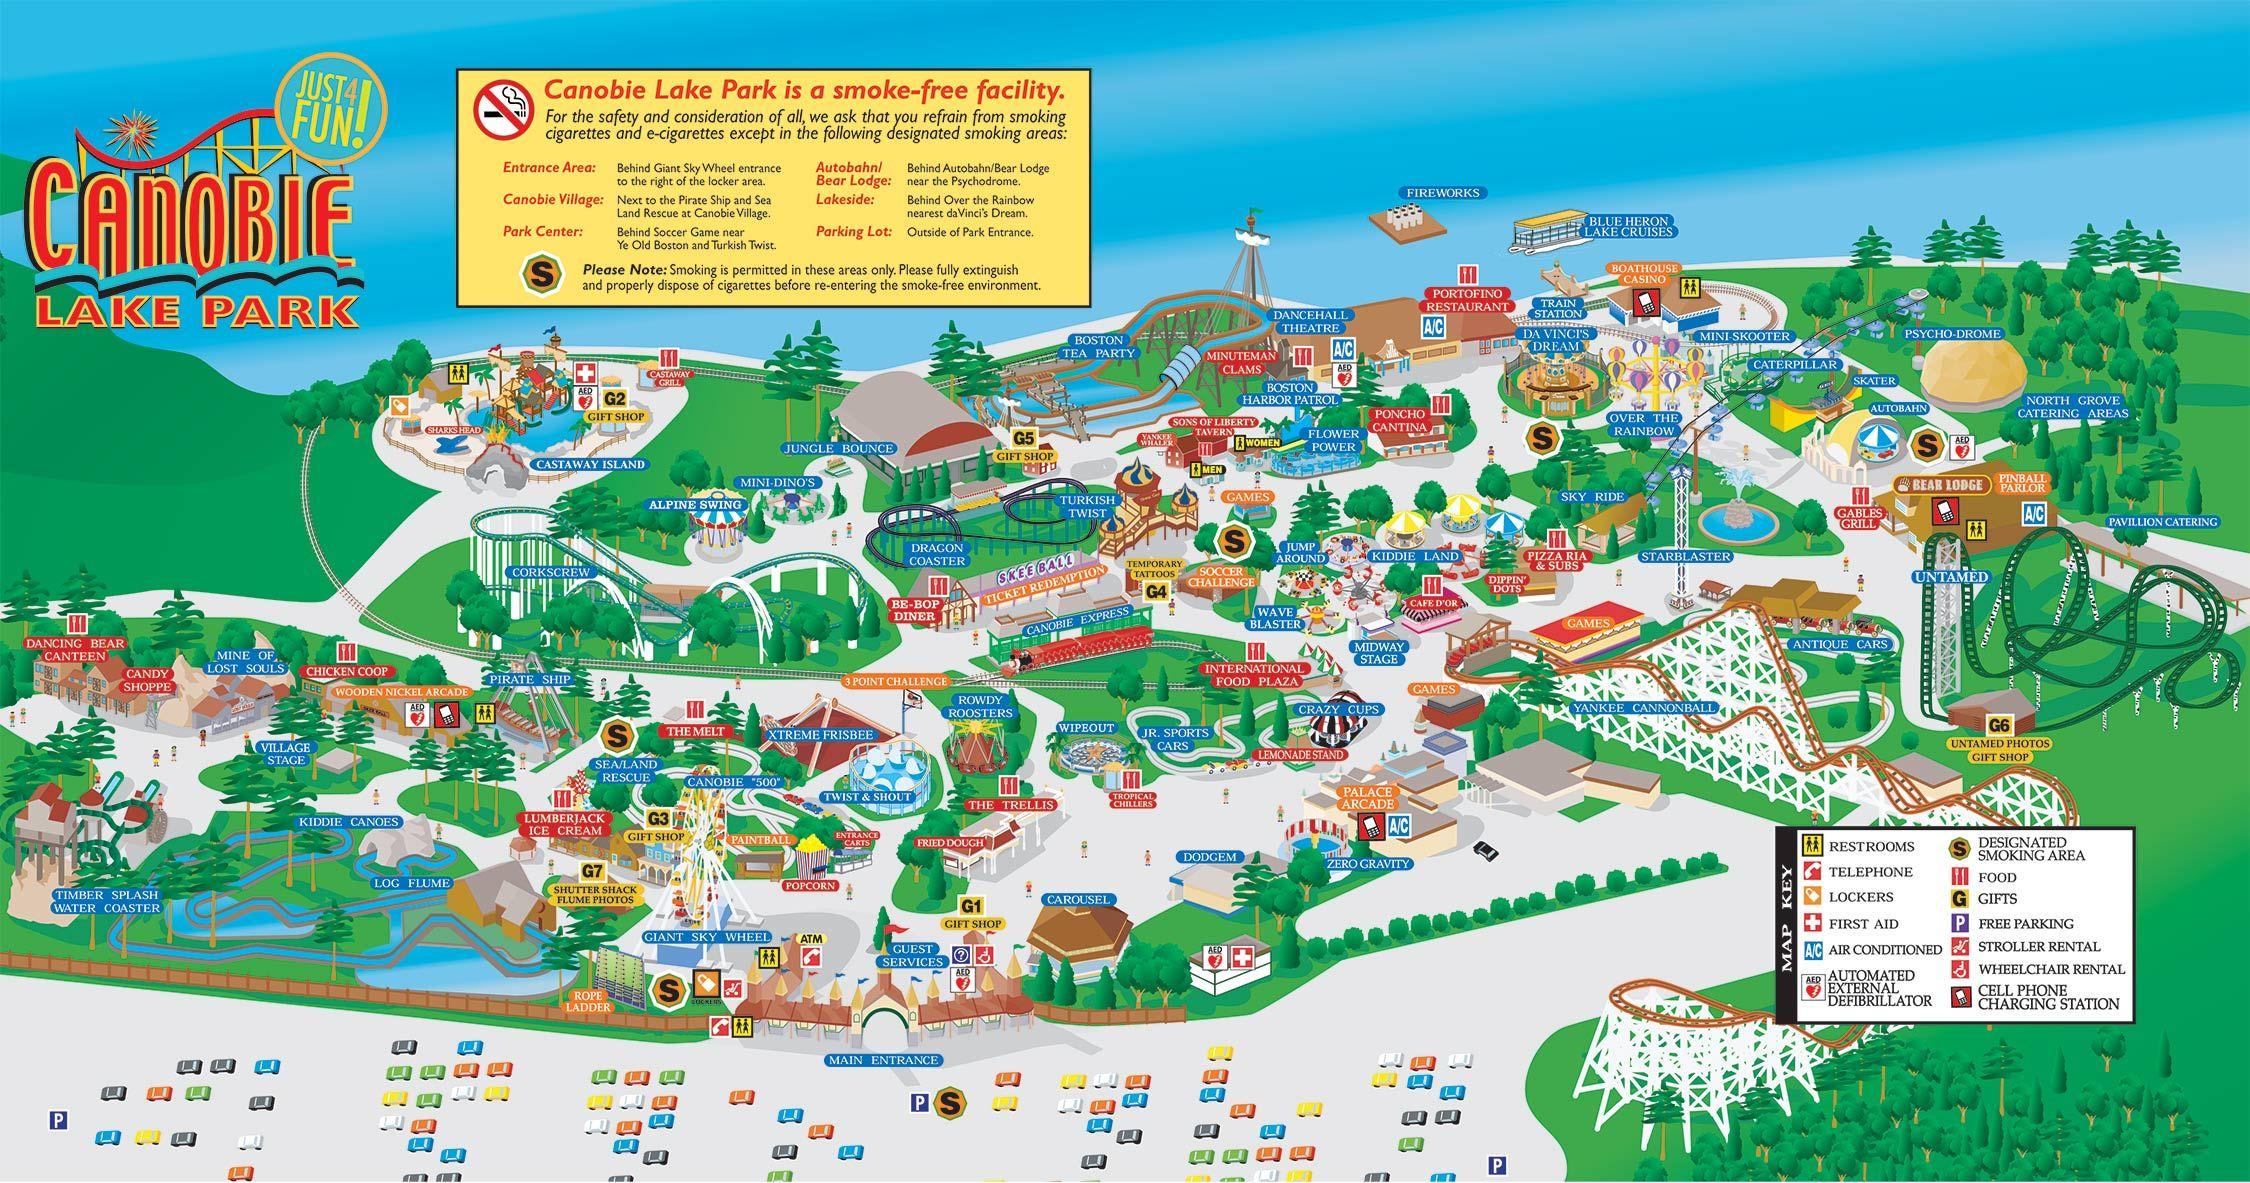 Canobie Lake Park Map Park Map | Canobie Lake Park | Map in 2019 | Canobie lake park